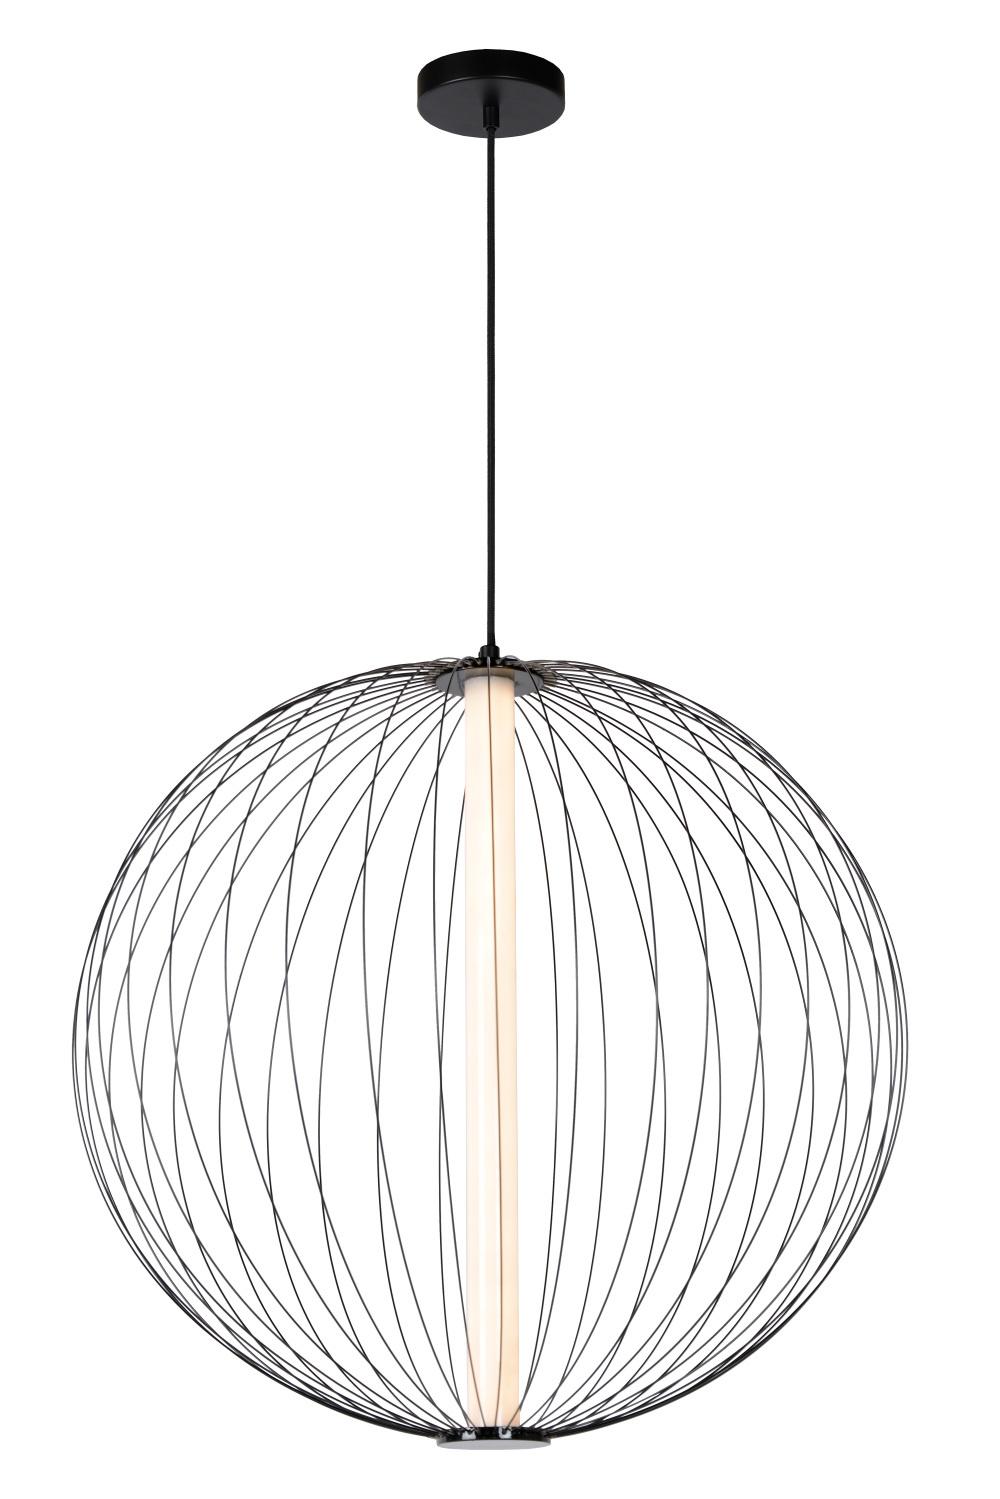 Lucide CARBONY Hanglamp-Zwart-Ø60-LED Dimb.-10W-2700K